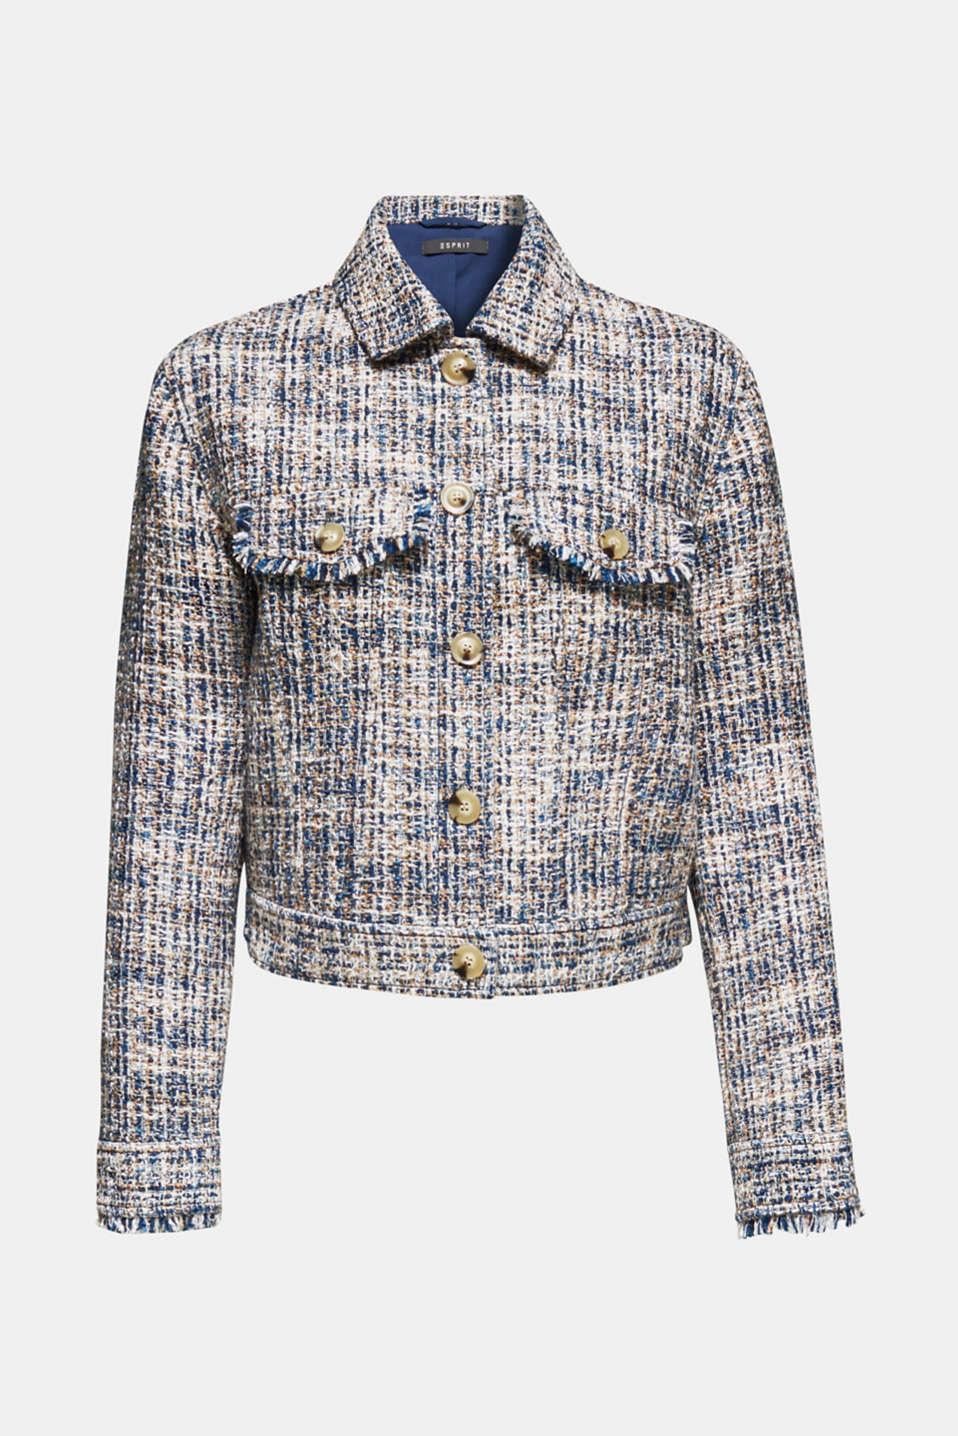 Jackets indoor woven, NAVY, detail image number 7